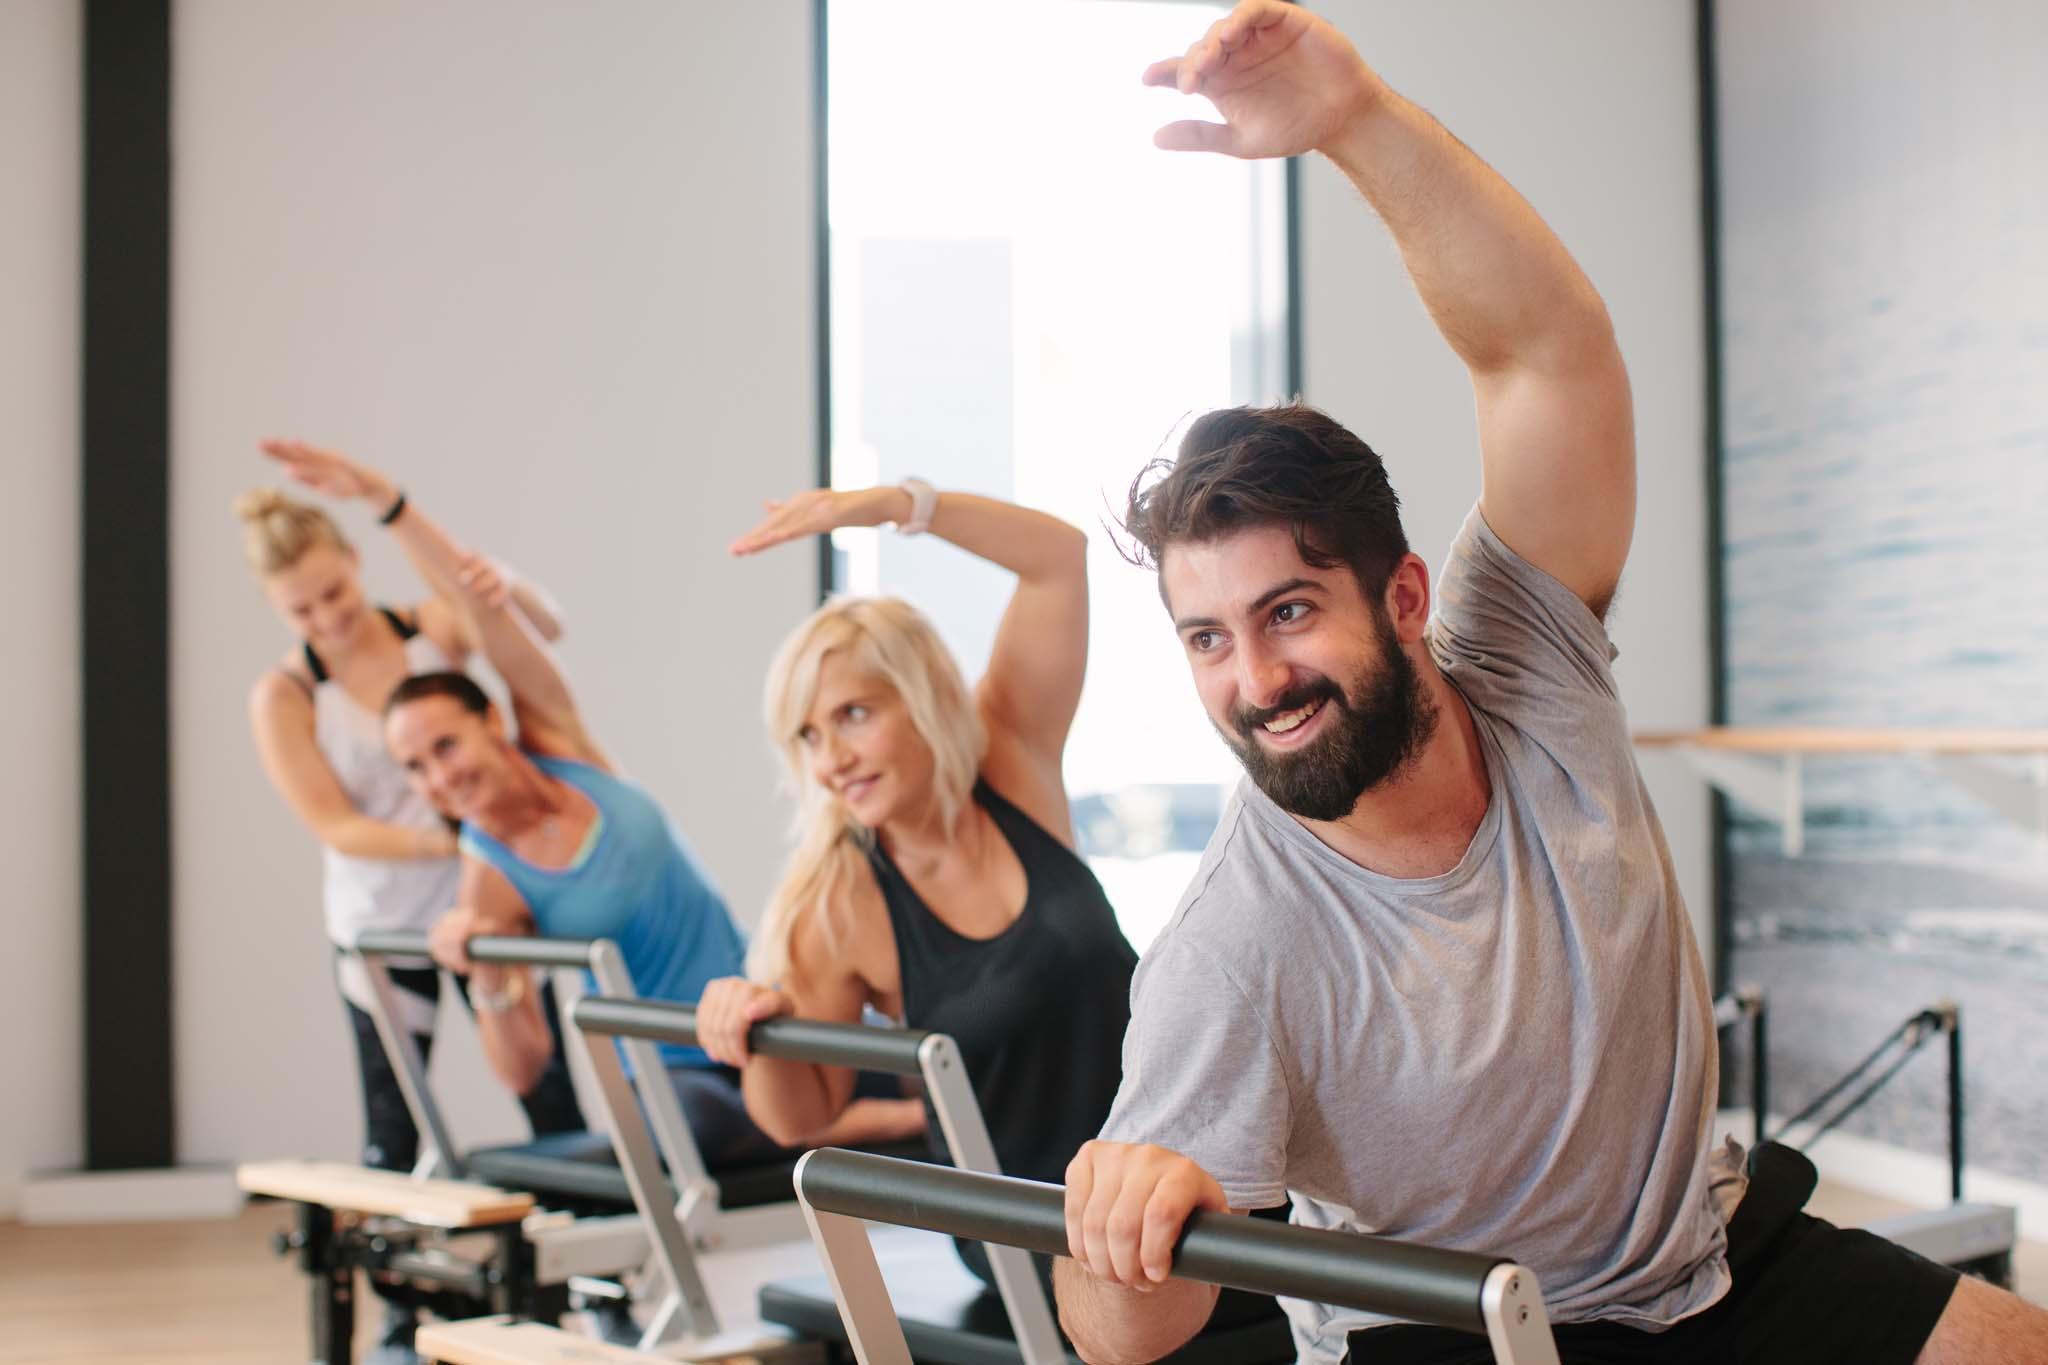 man smiles in reformer pilates class.jpg